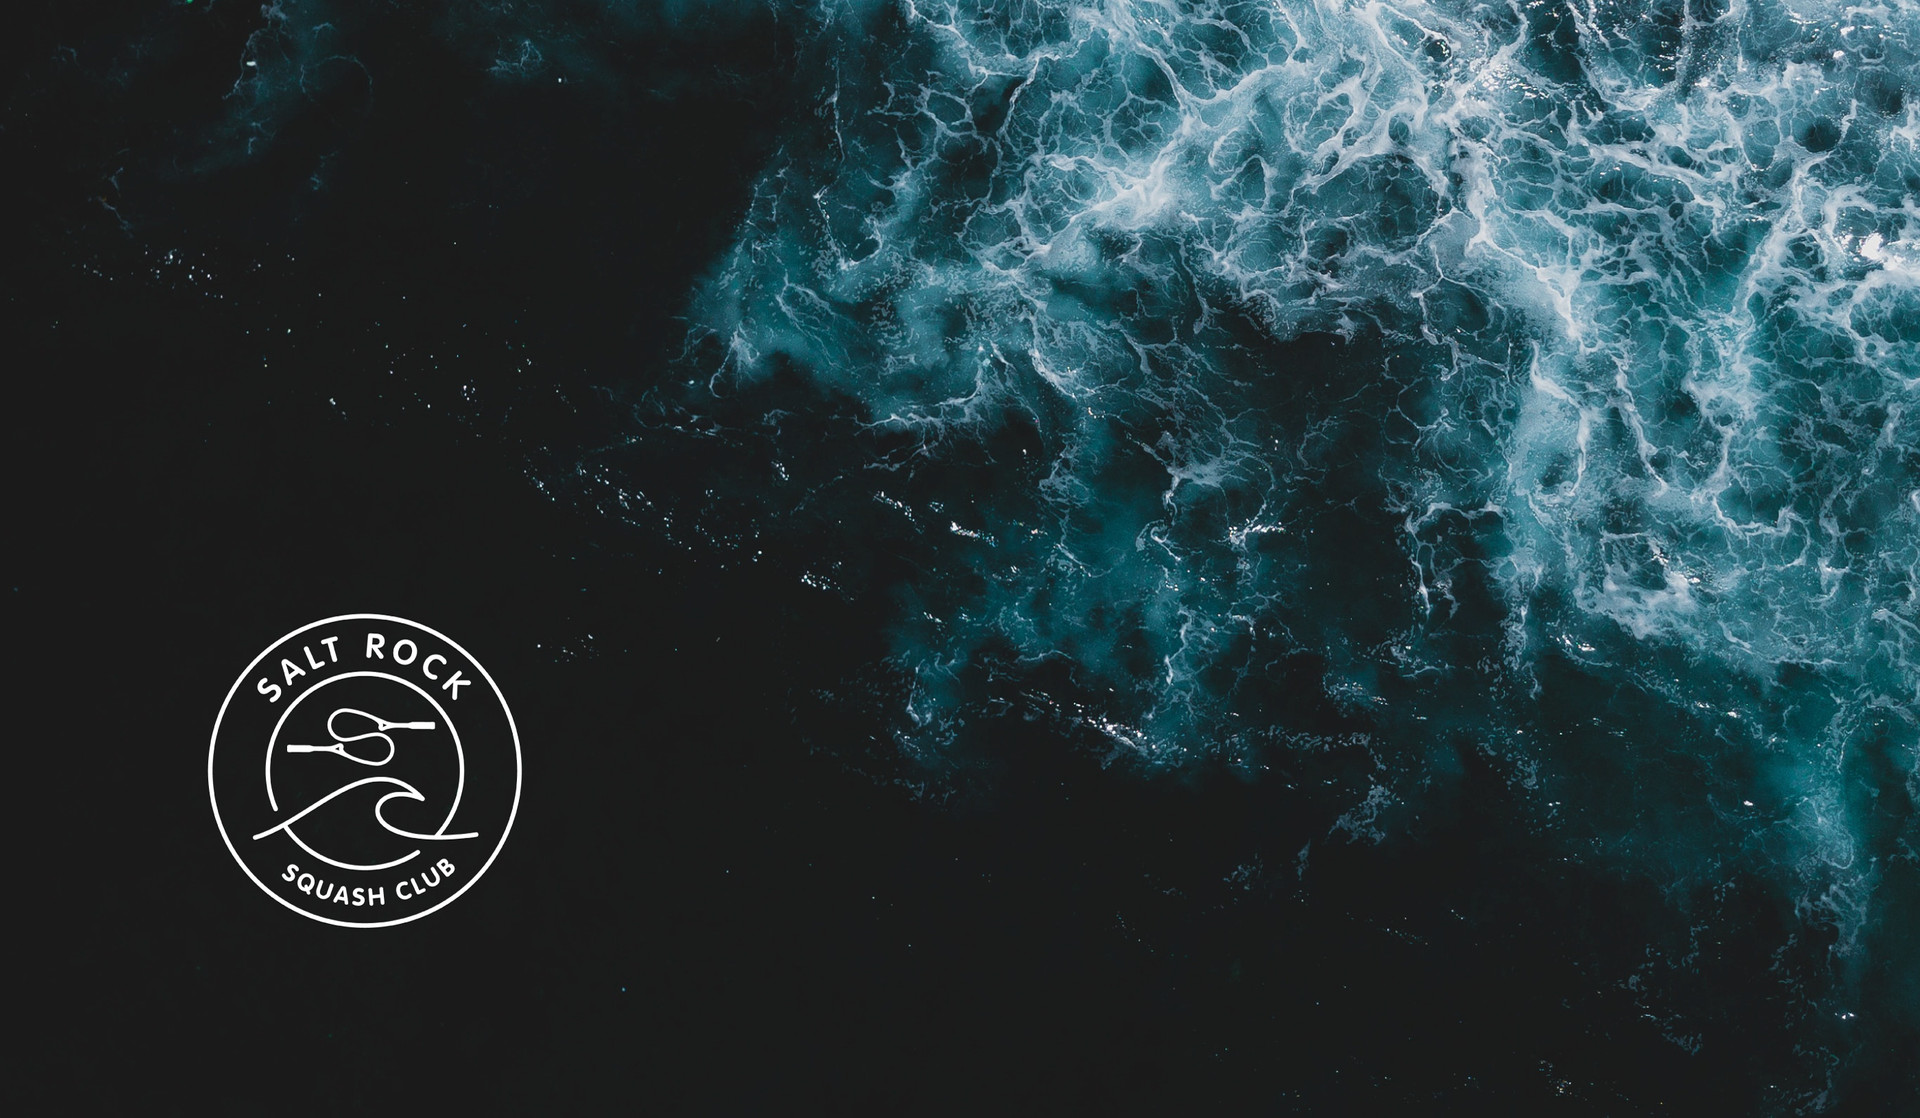 Salt-Rock-Squash-Club-logo-design-01.jpg